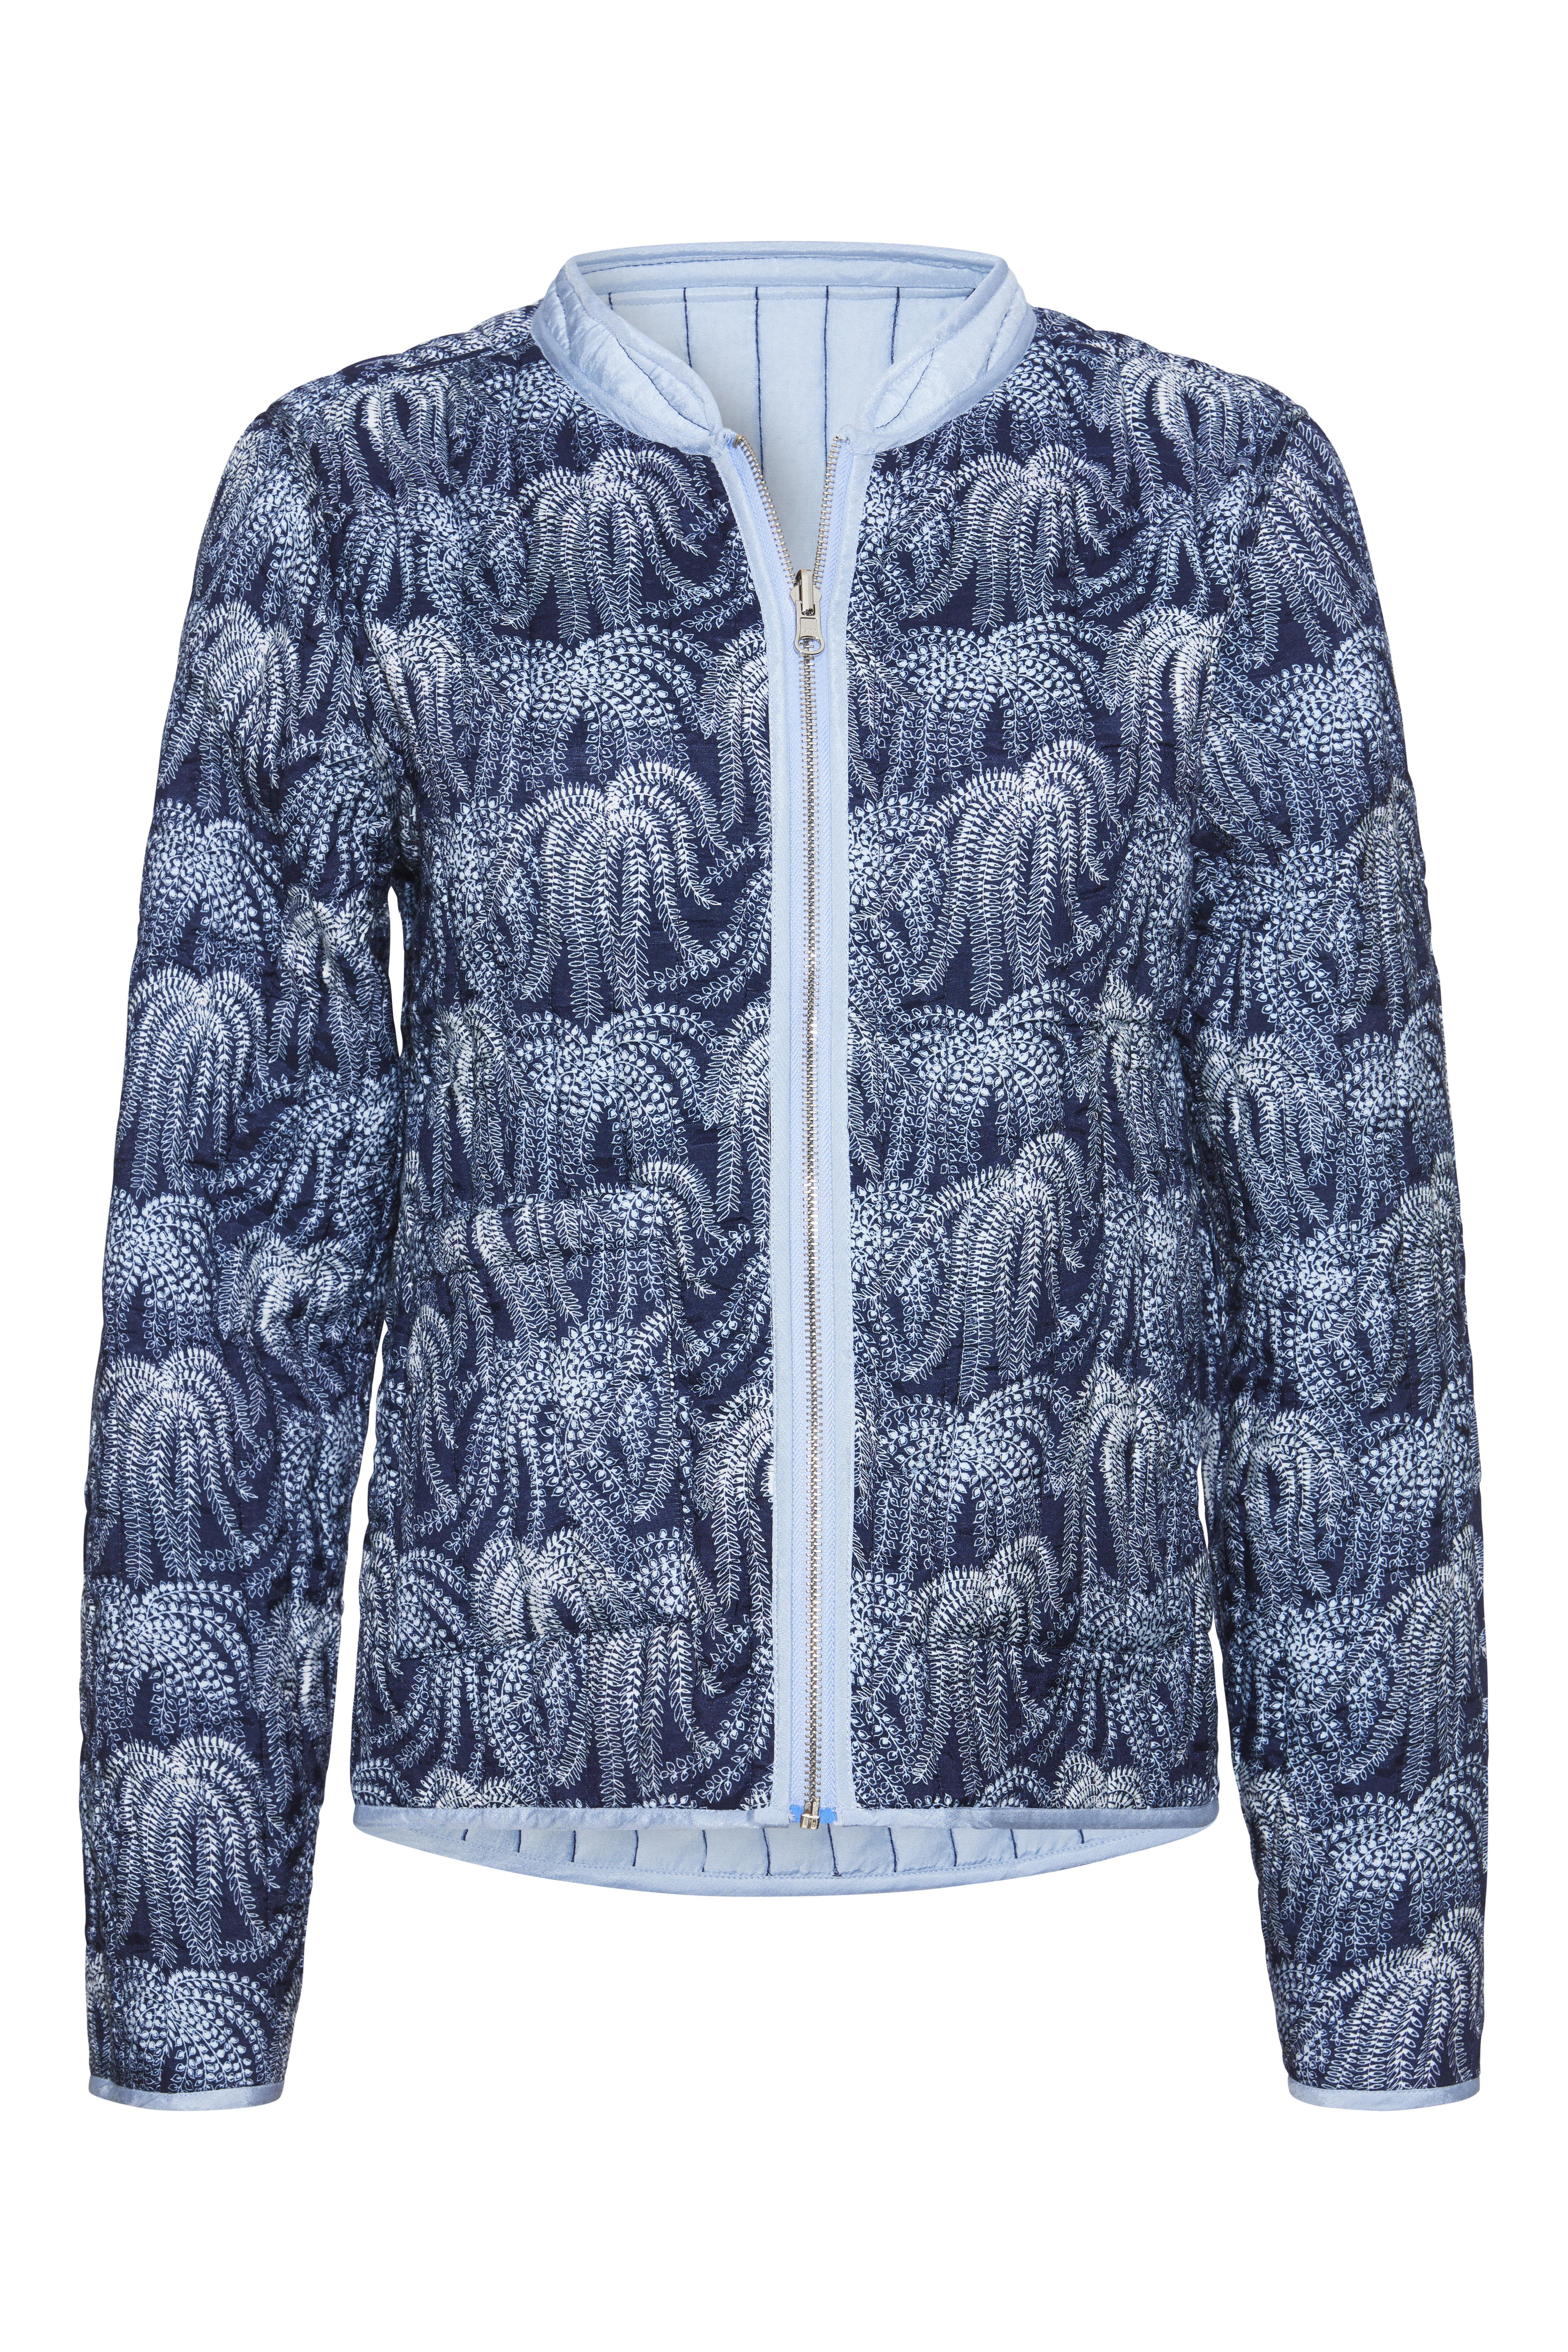 PBO Howli jakke, blue iris, 42